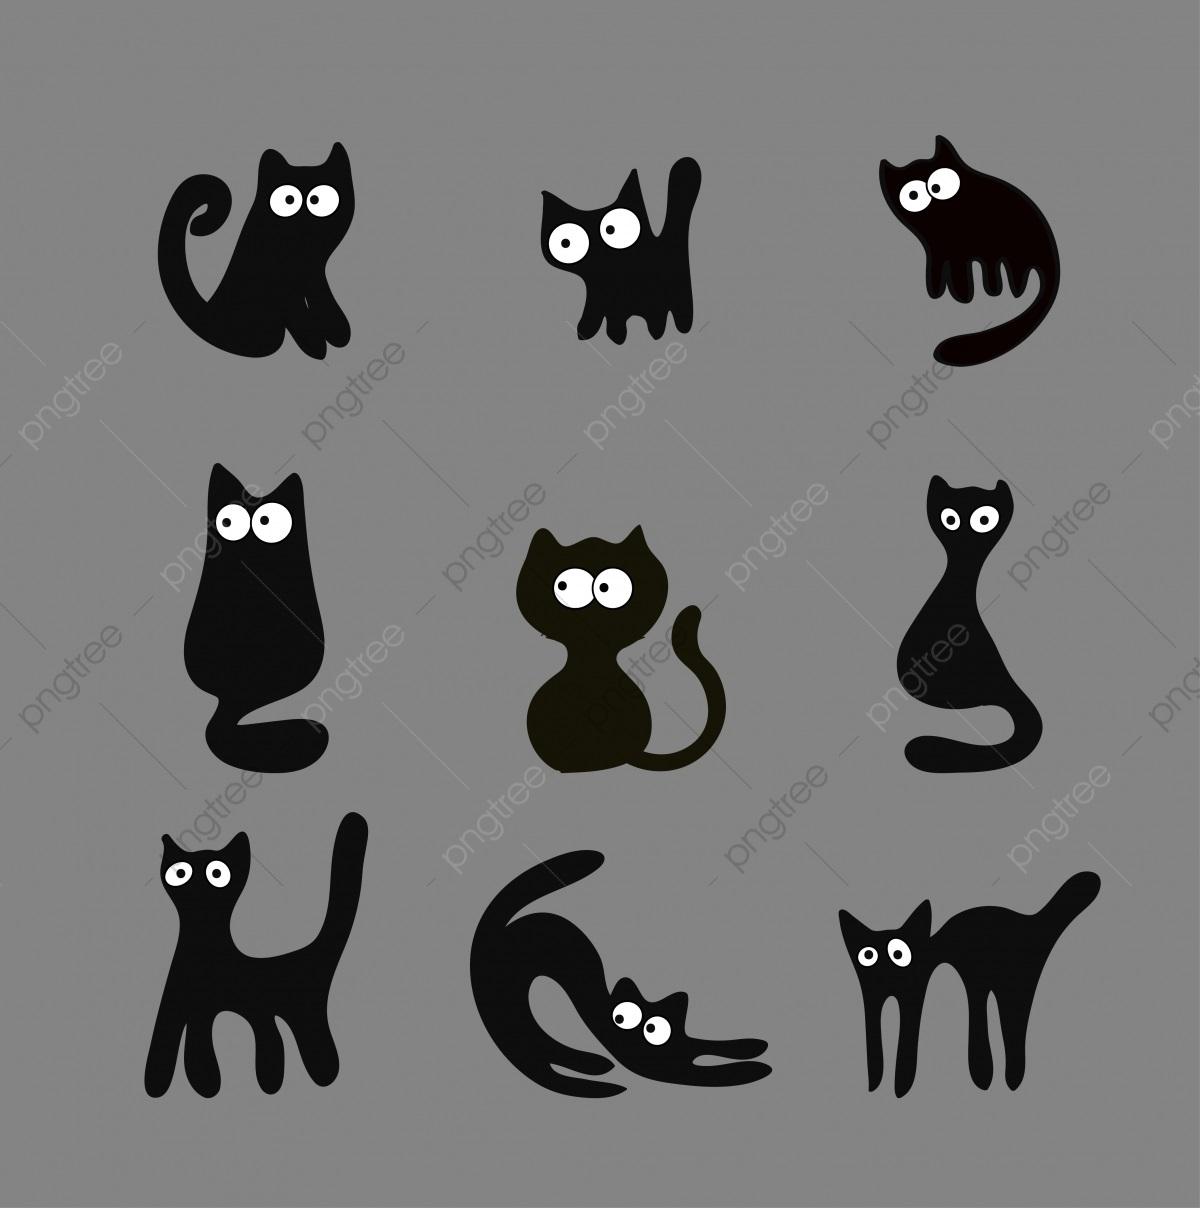 Черно белый силуэт кошки005